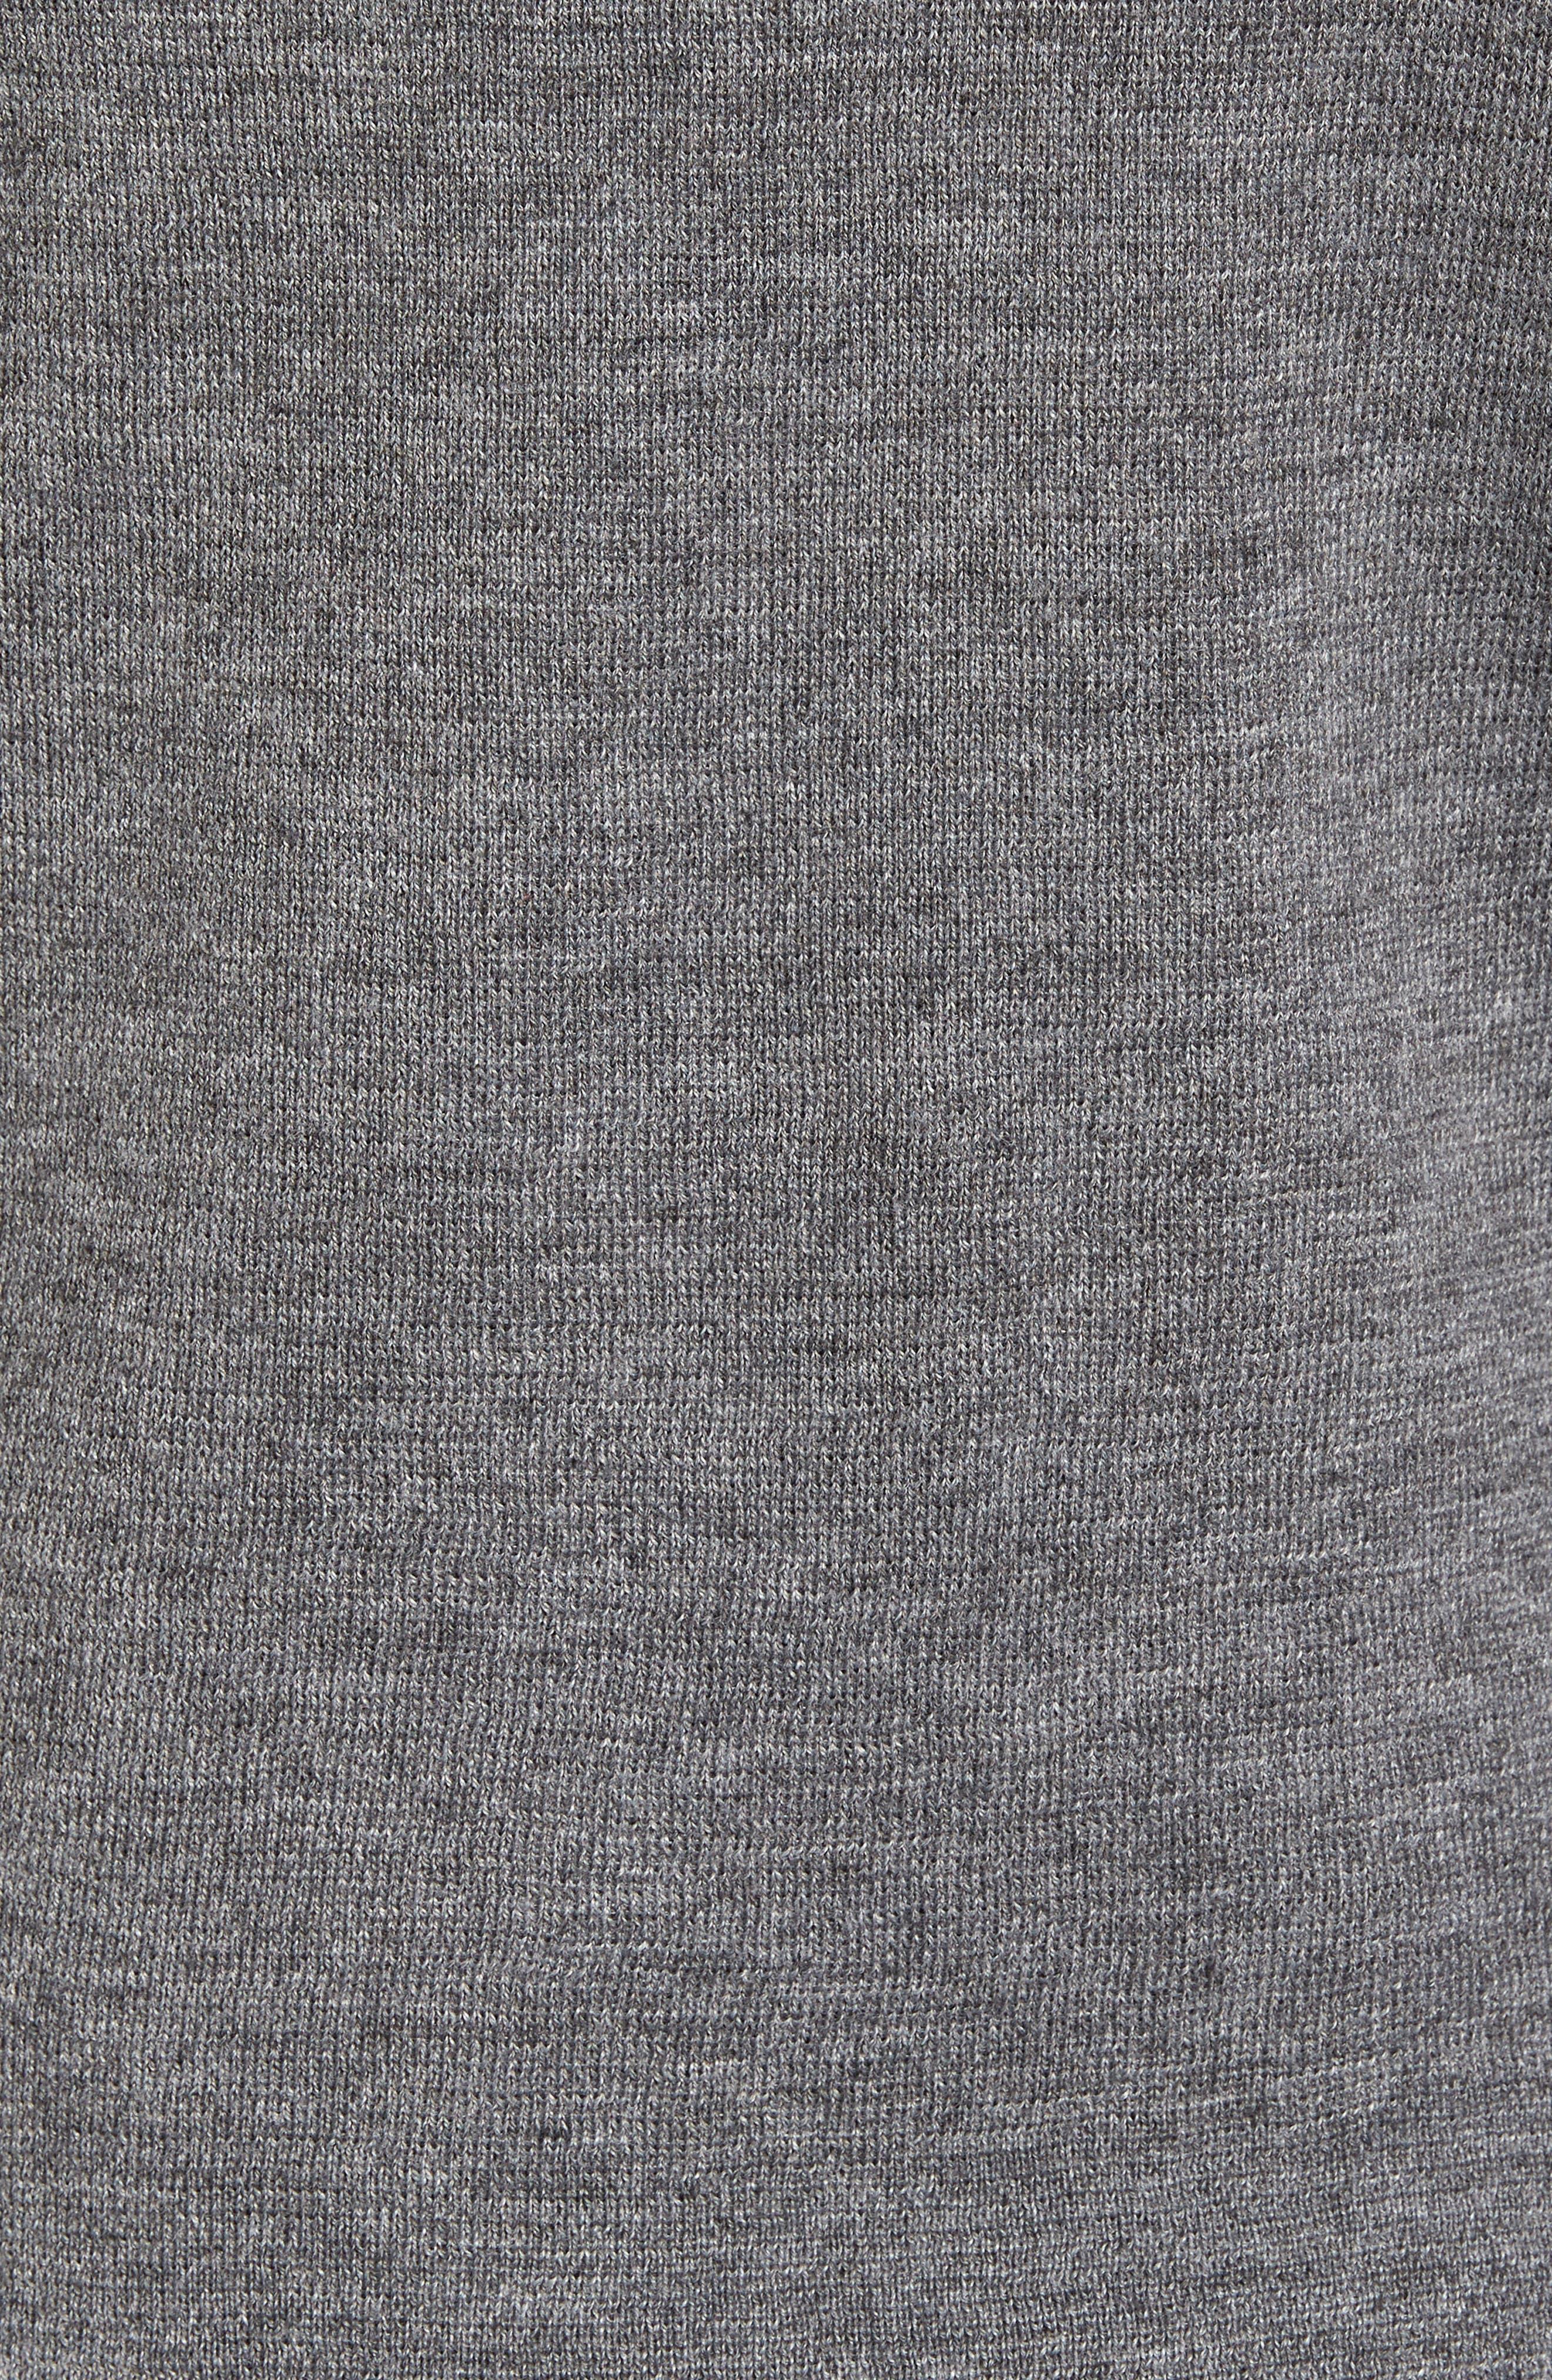 Merino Wool Blend Turtleneck Sweater,                             Alternate thumbnail 3, color,                             020